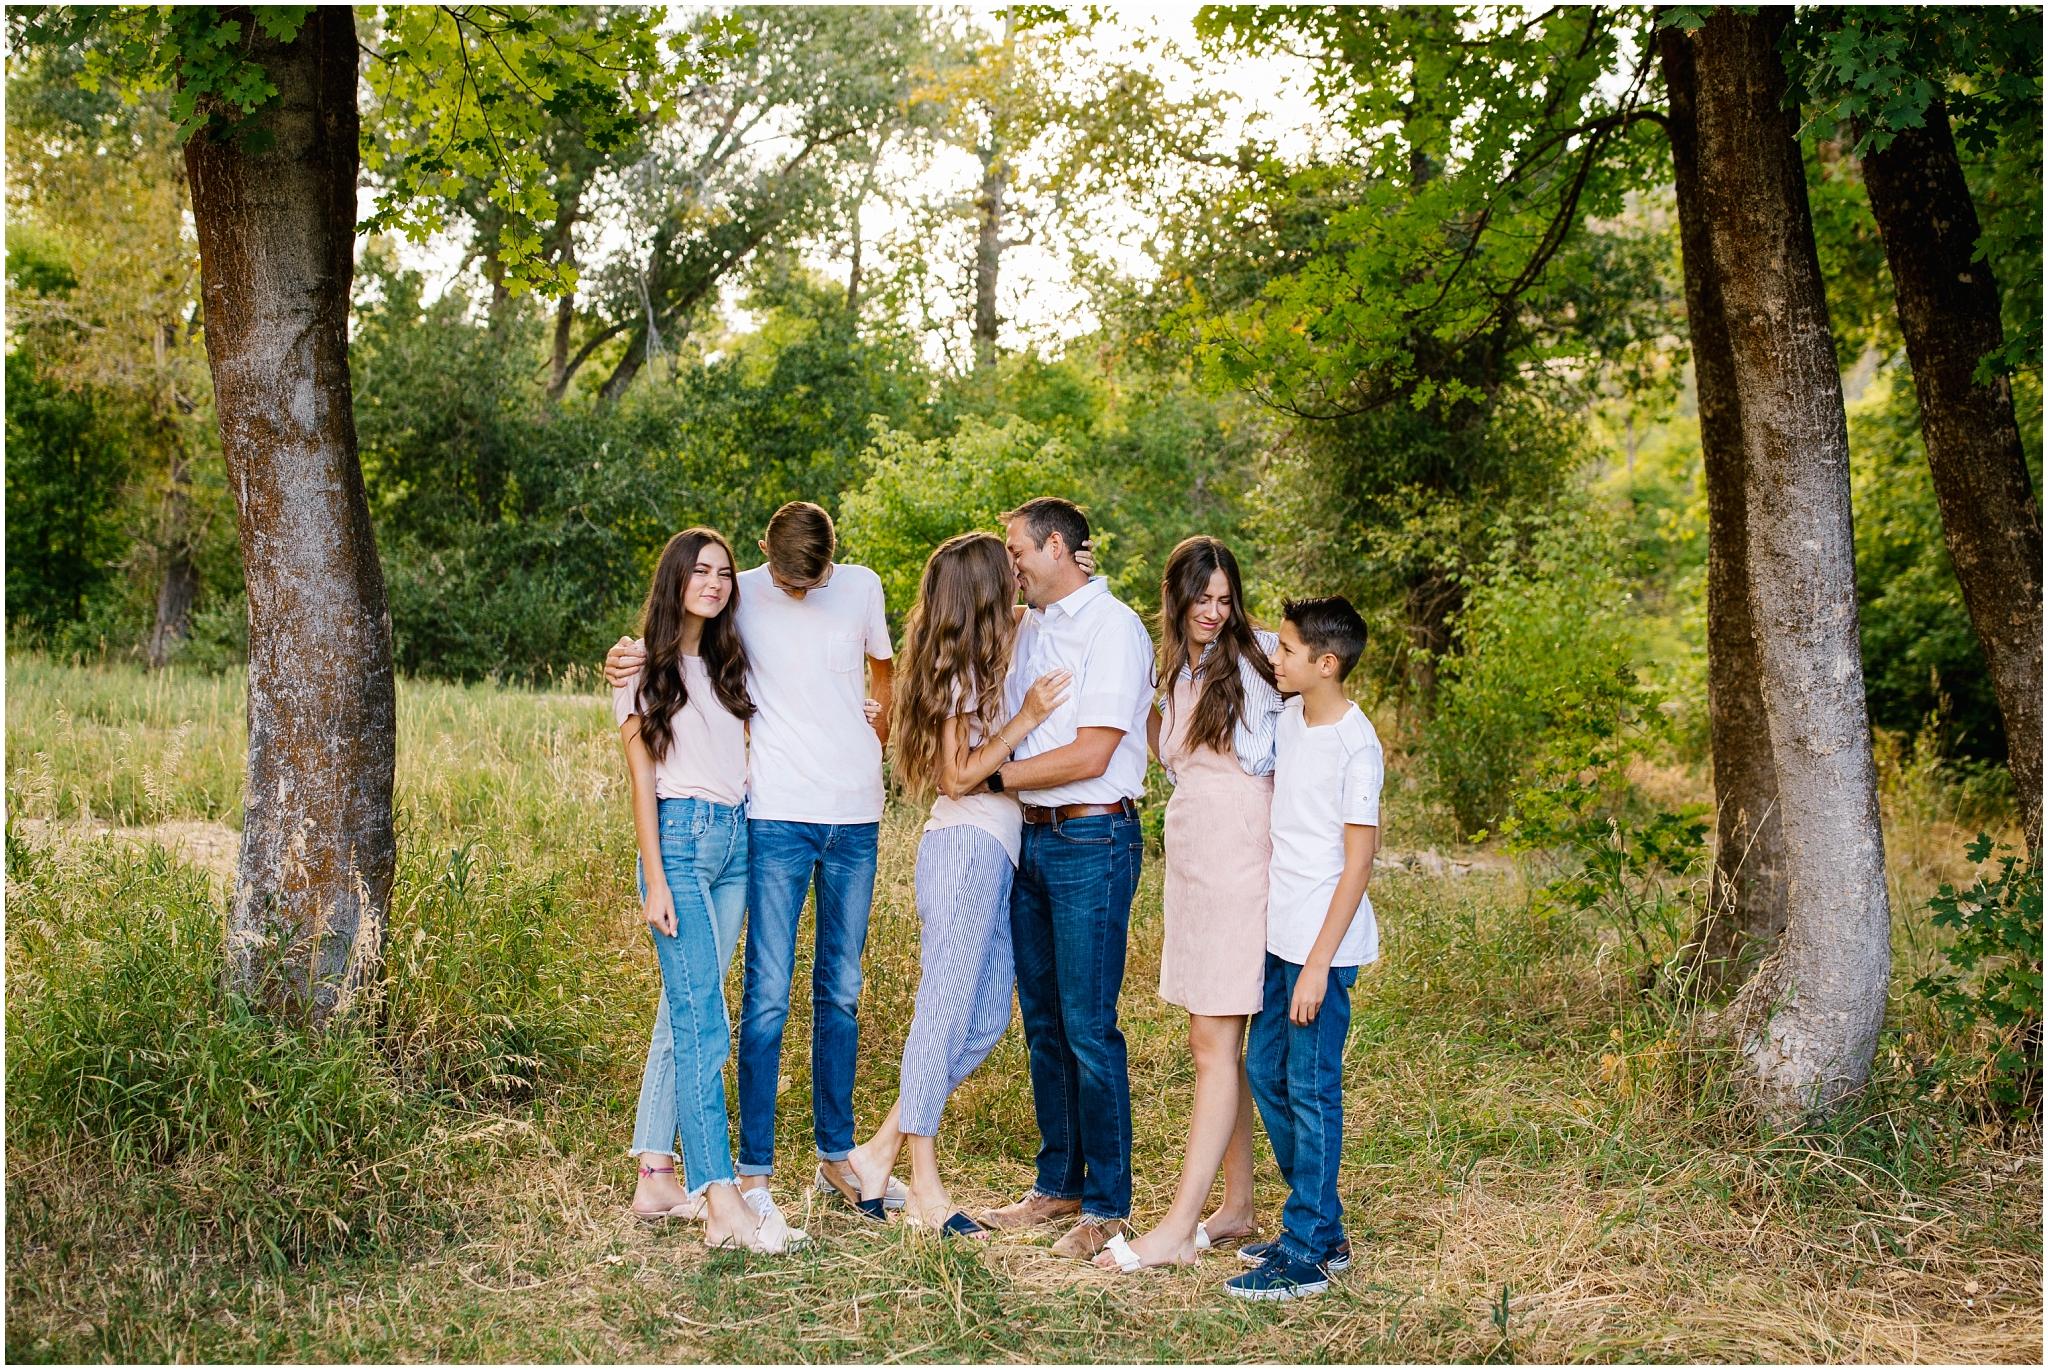 Overly-14_Lizzie-B-Imagery-Utah-Family-Photographer-Salt-Lake-City-Park-City-Utah-County-Hobble-Creek-Canyon-Jolleys-Ranch.jpg